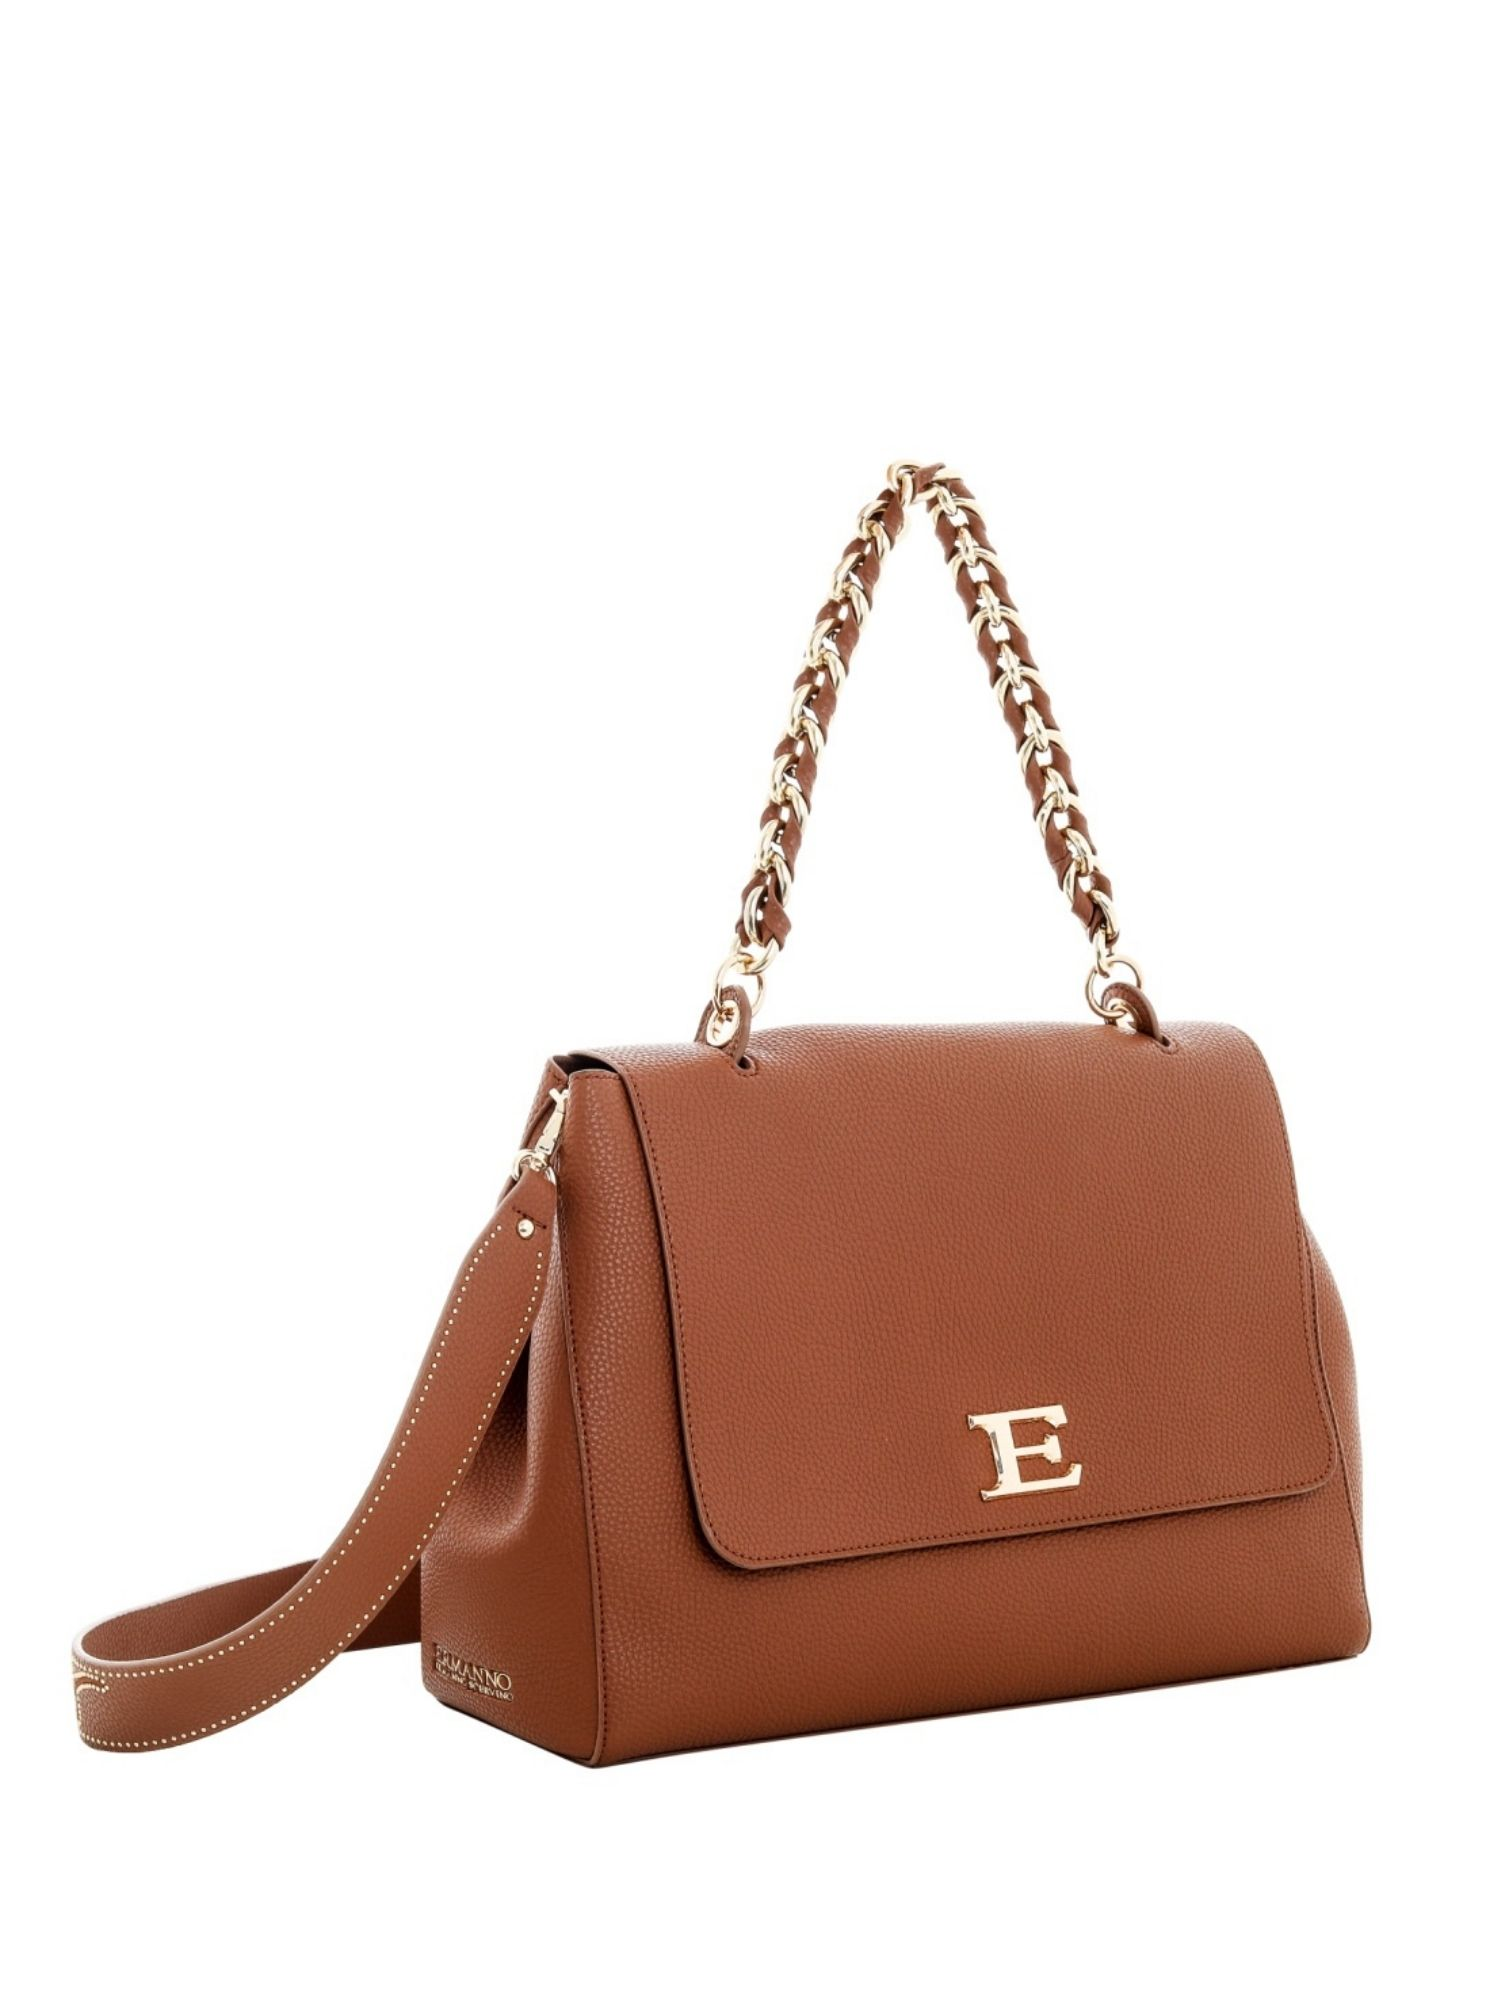 Borsa shopping Ermanno Scervino Eba 12401133 cuoio